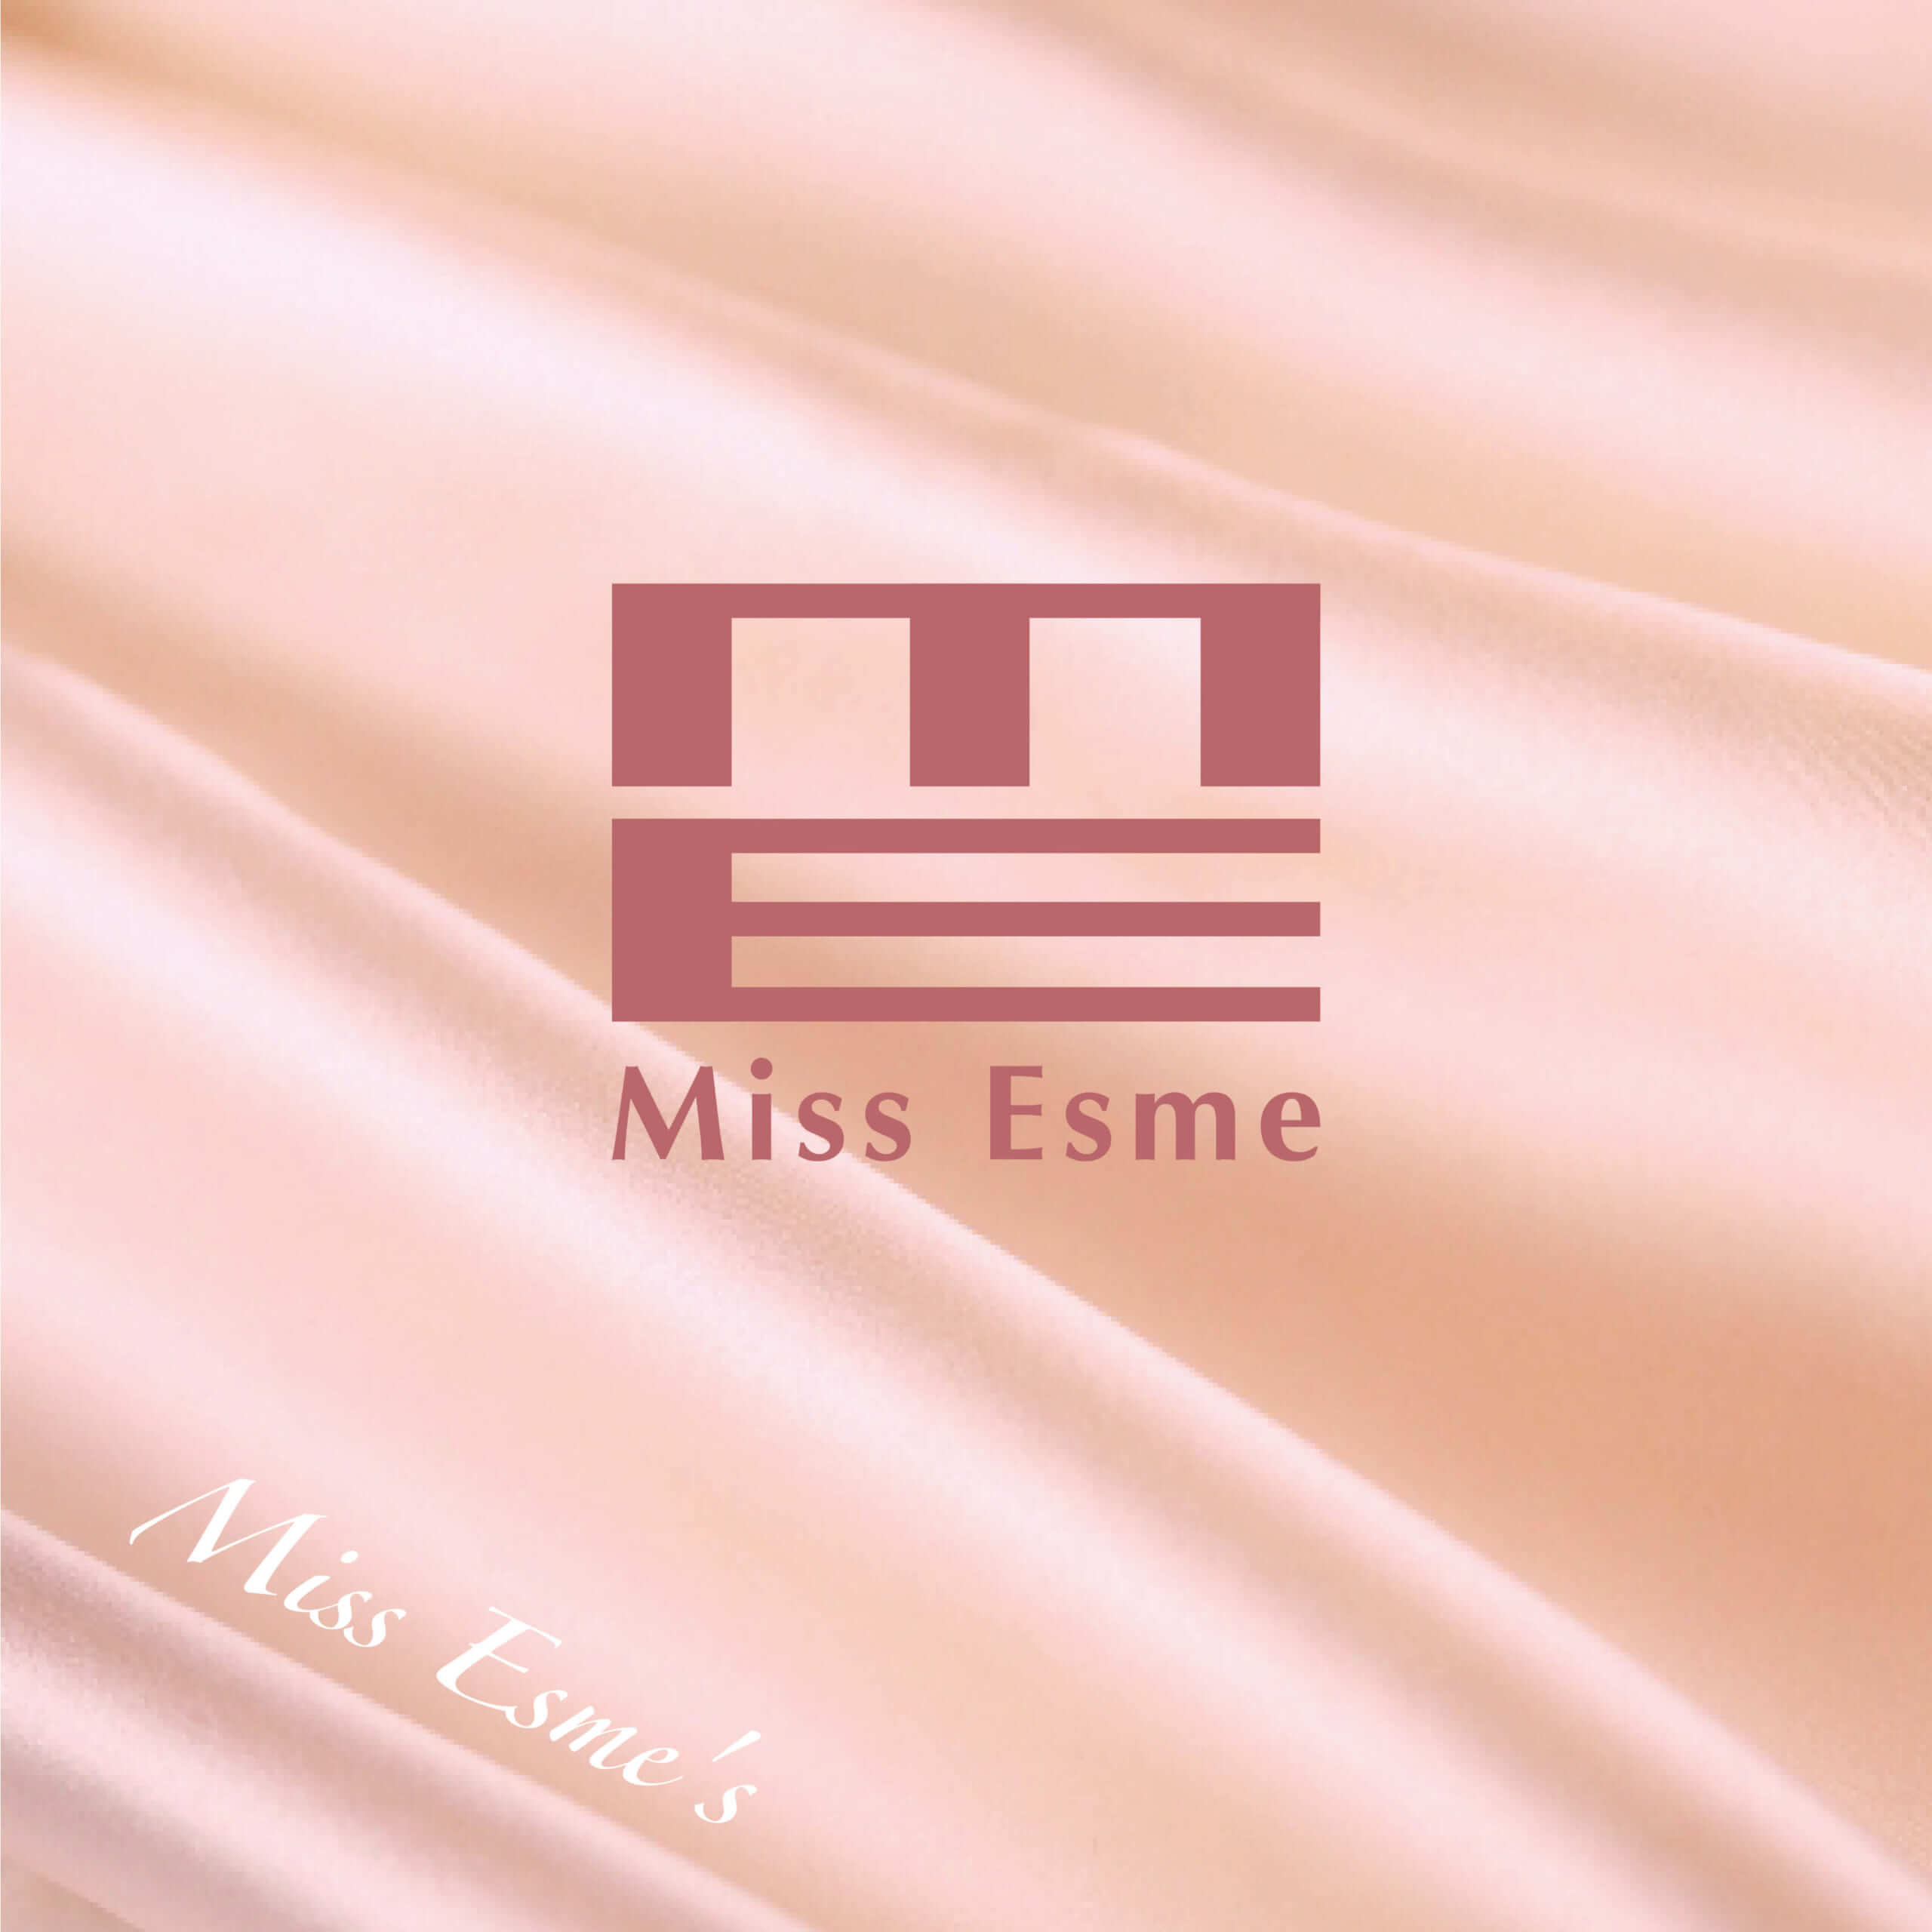 Miss Esme(ミスエスメ)のブランドロゴ